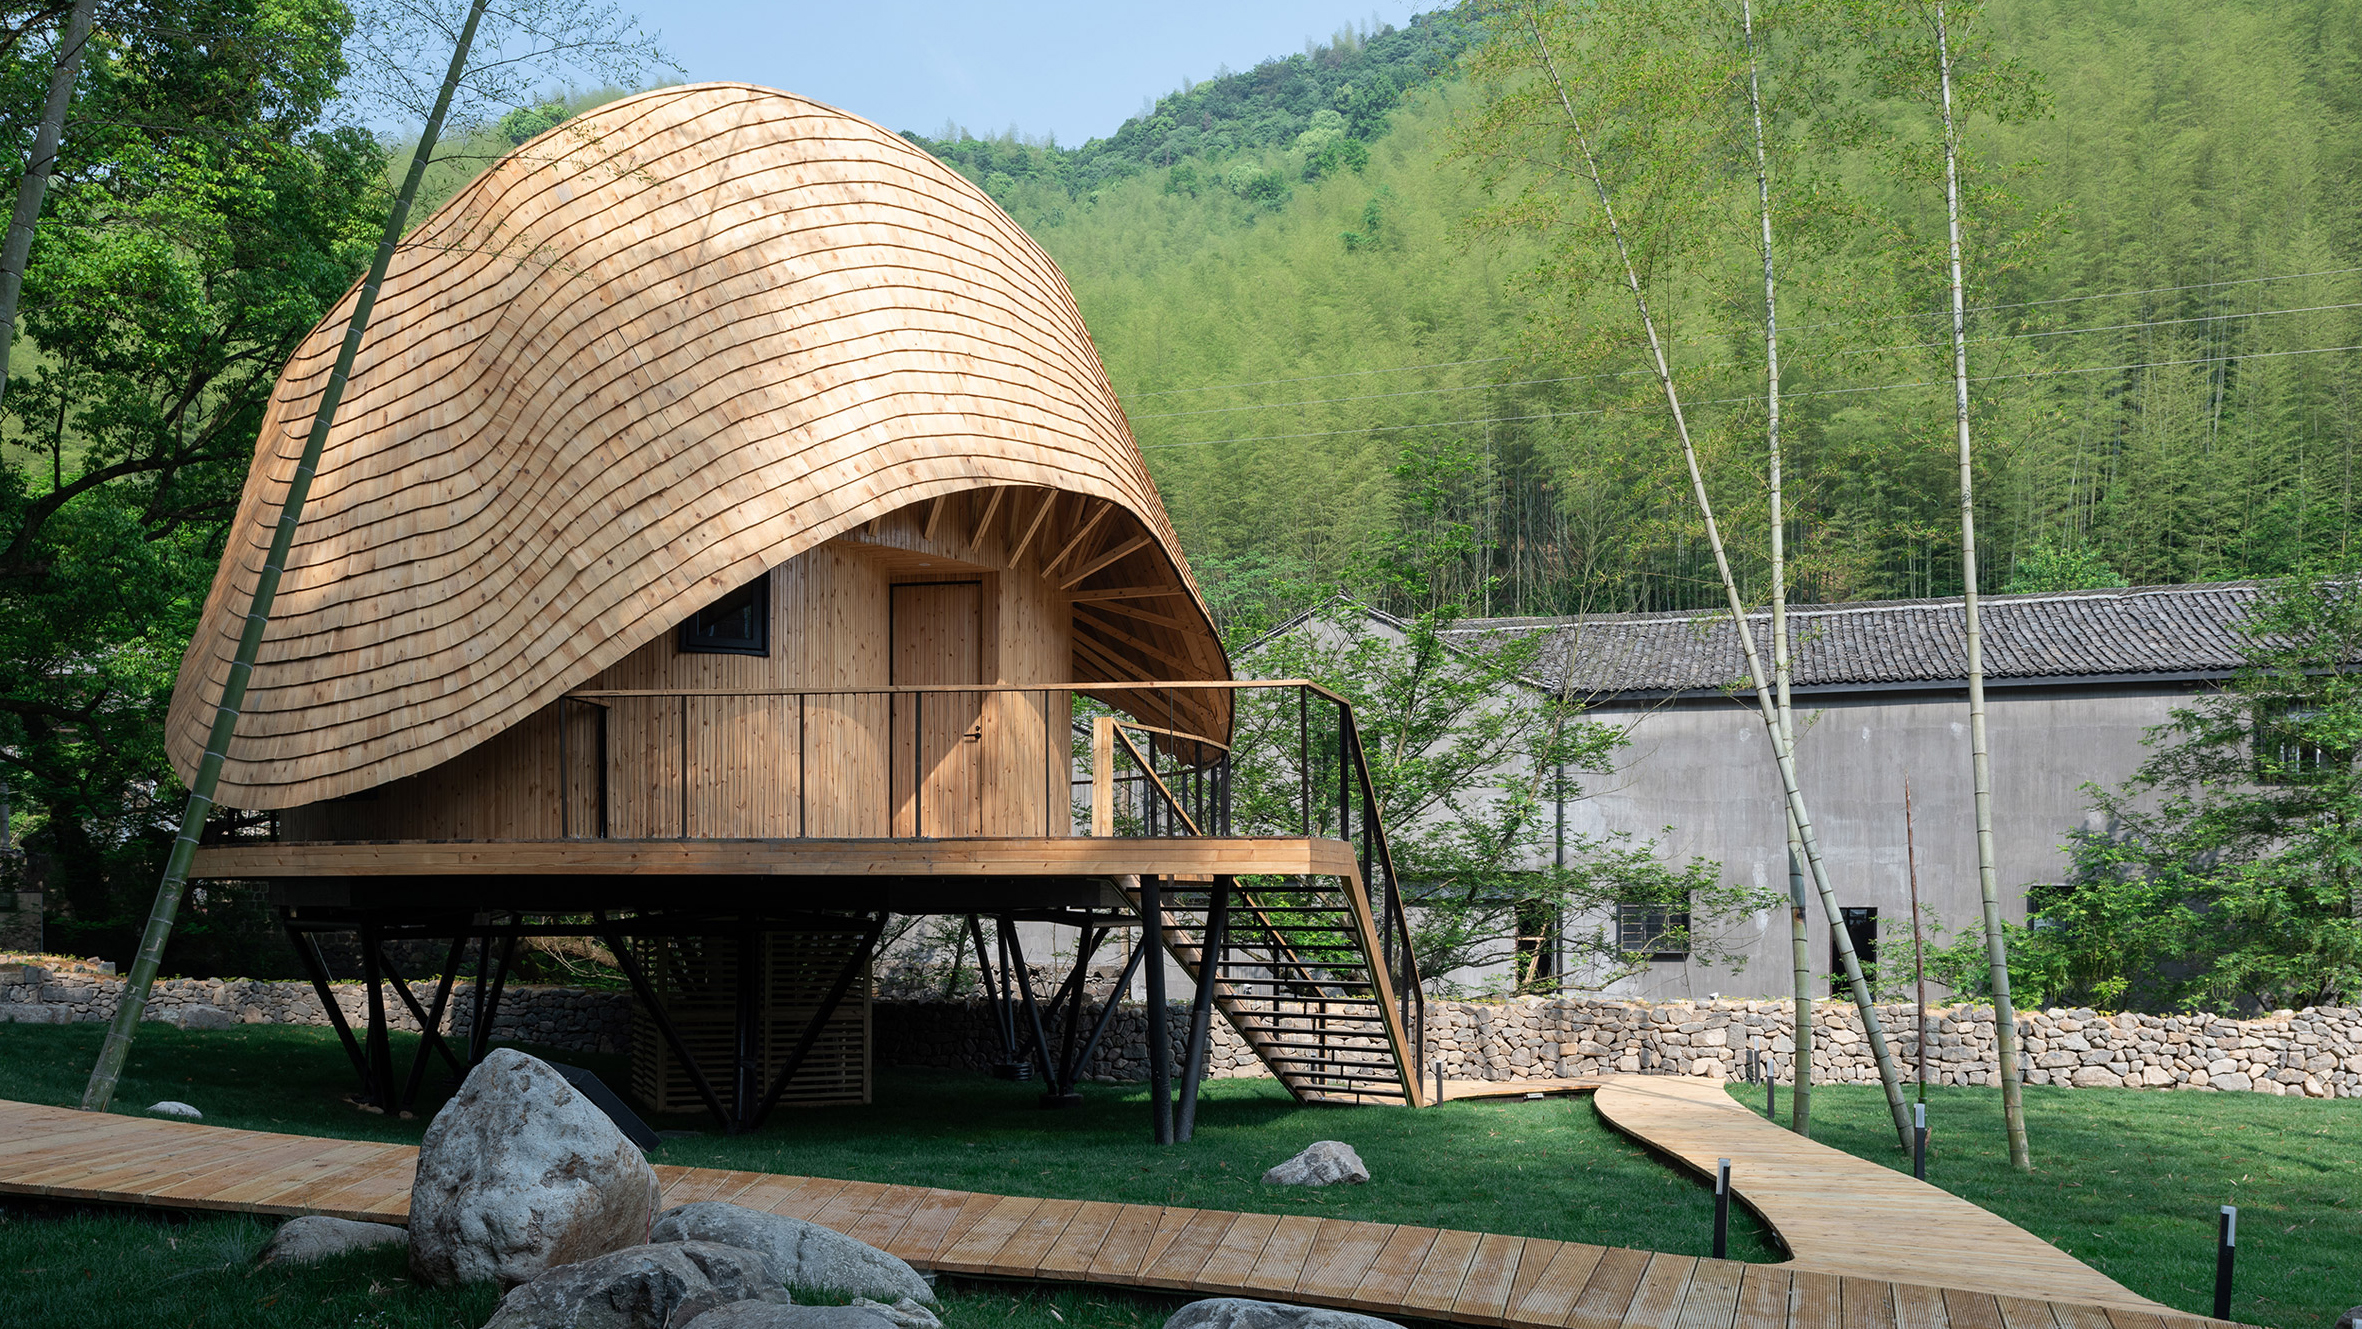 Treewow Retreat, China, by Monoarchi